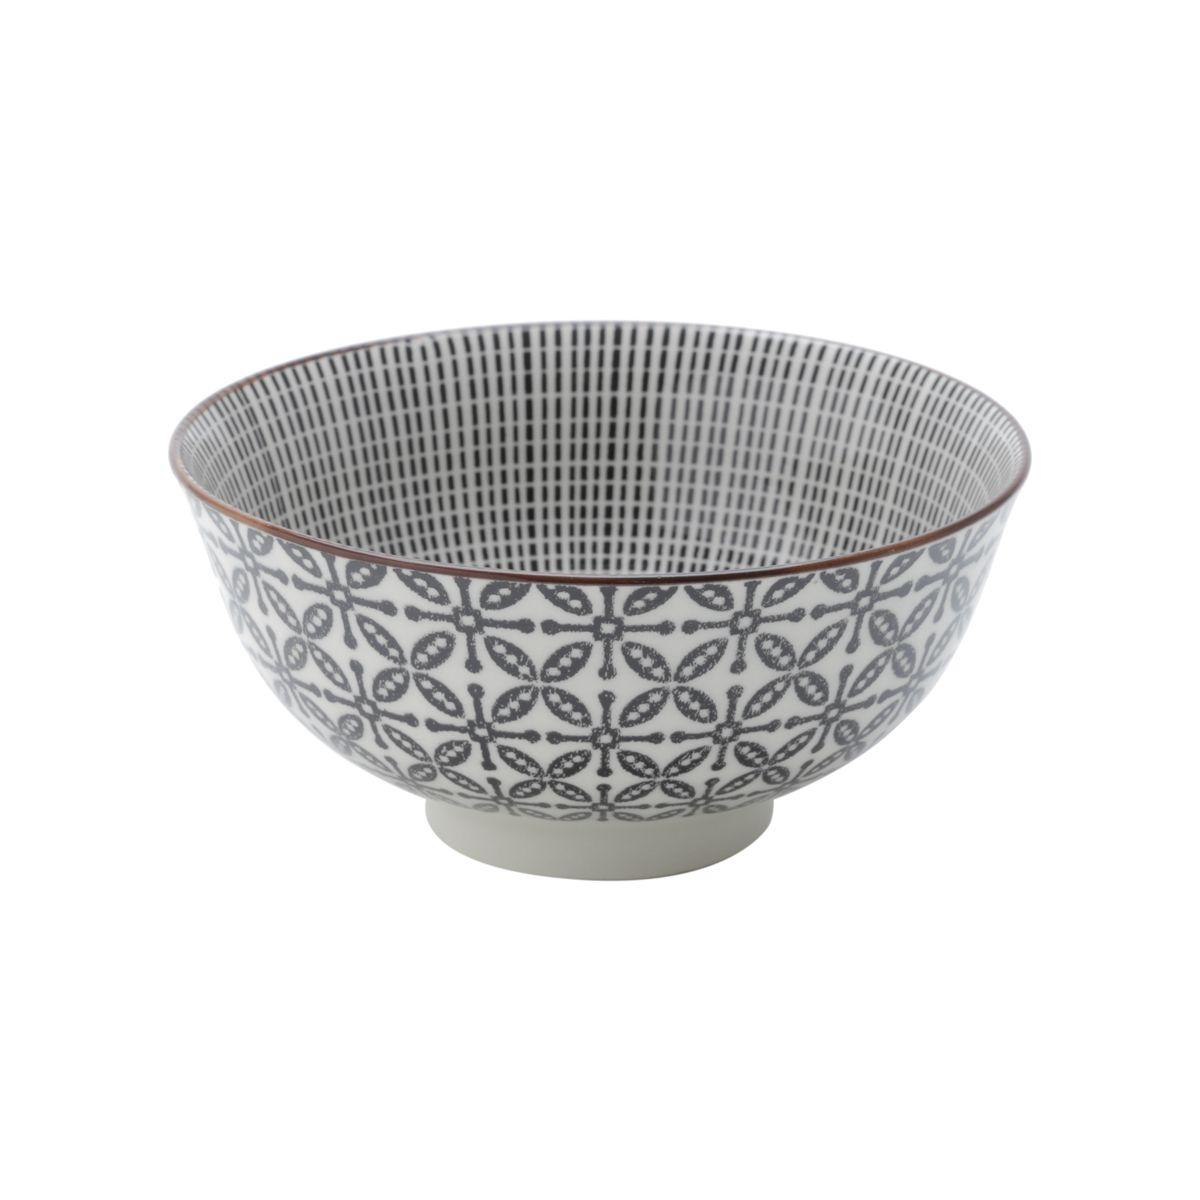 Conjunto de 4 Bowls de Porcelana  12x5,5cm